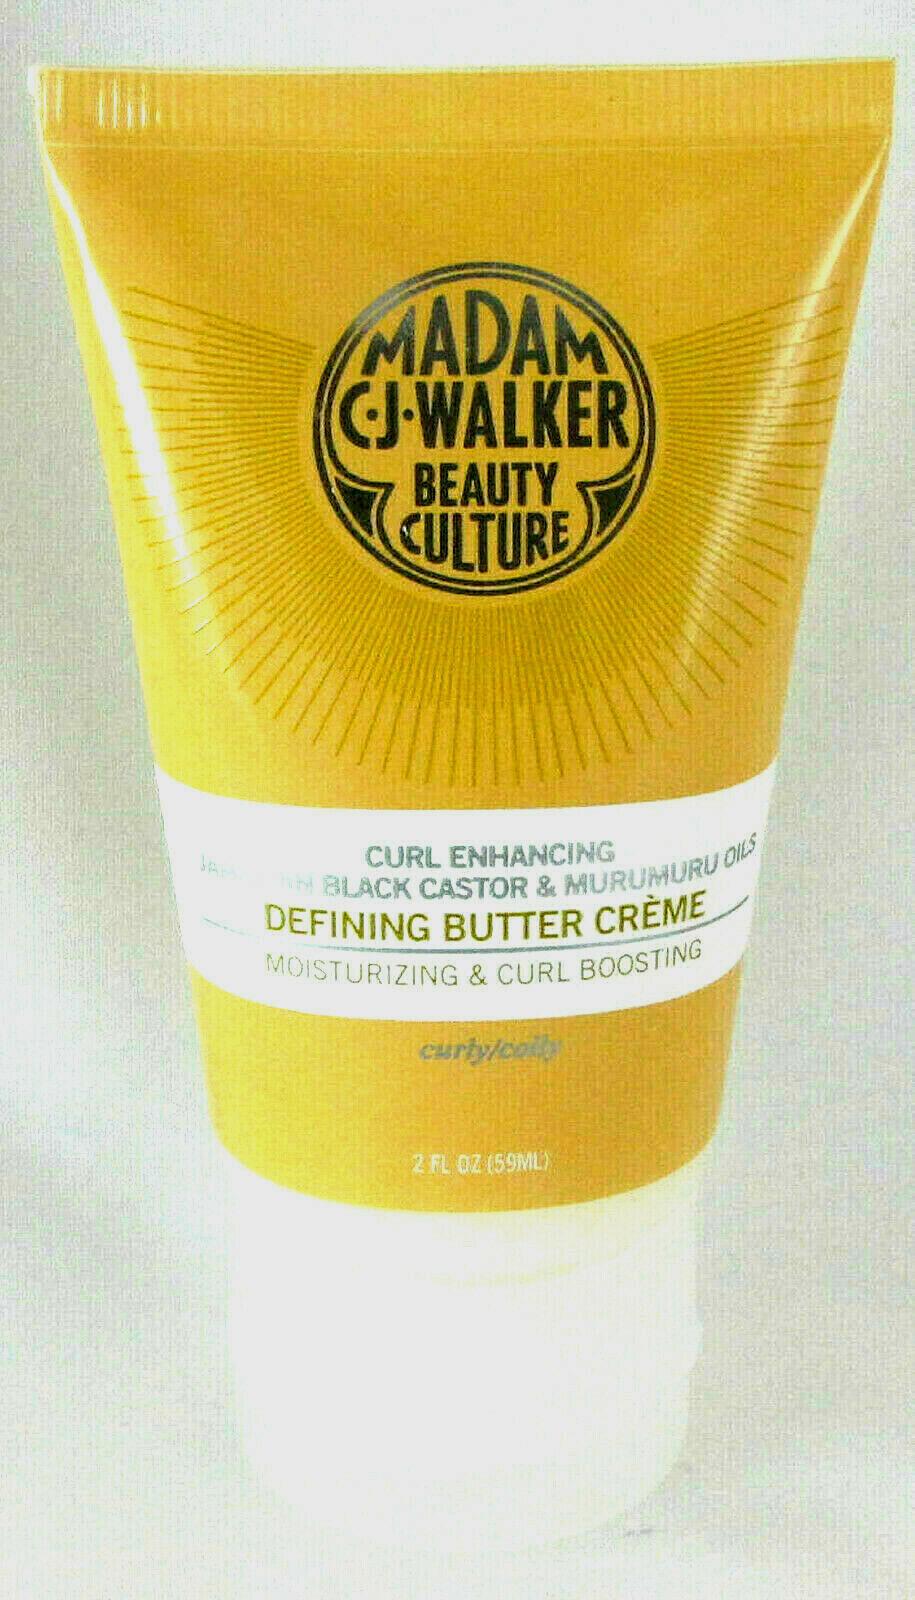 Madam CJ. Walker Beauty Culture Curl Enhancing Defining Butter Creme 2oz NEW - $20.00